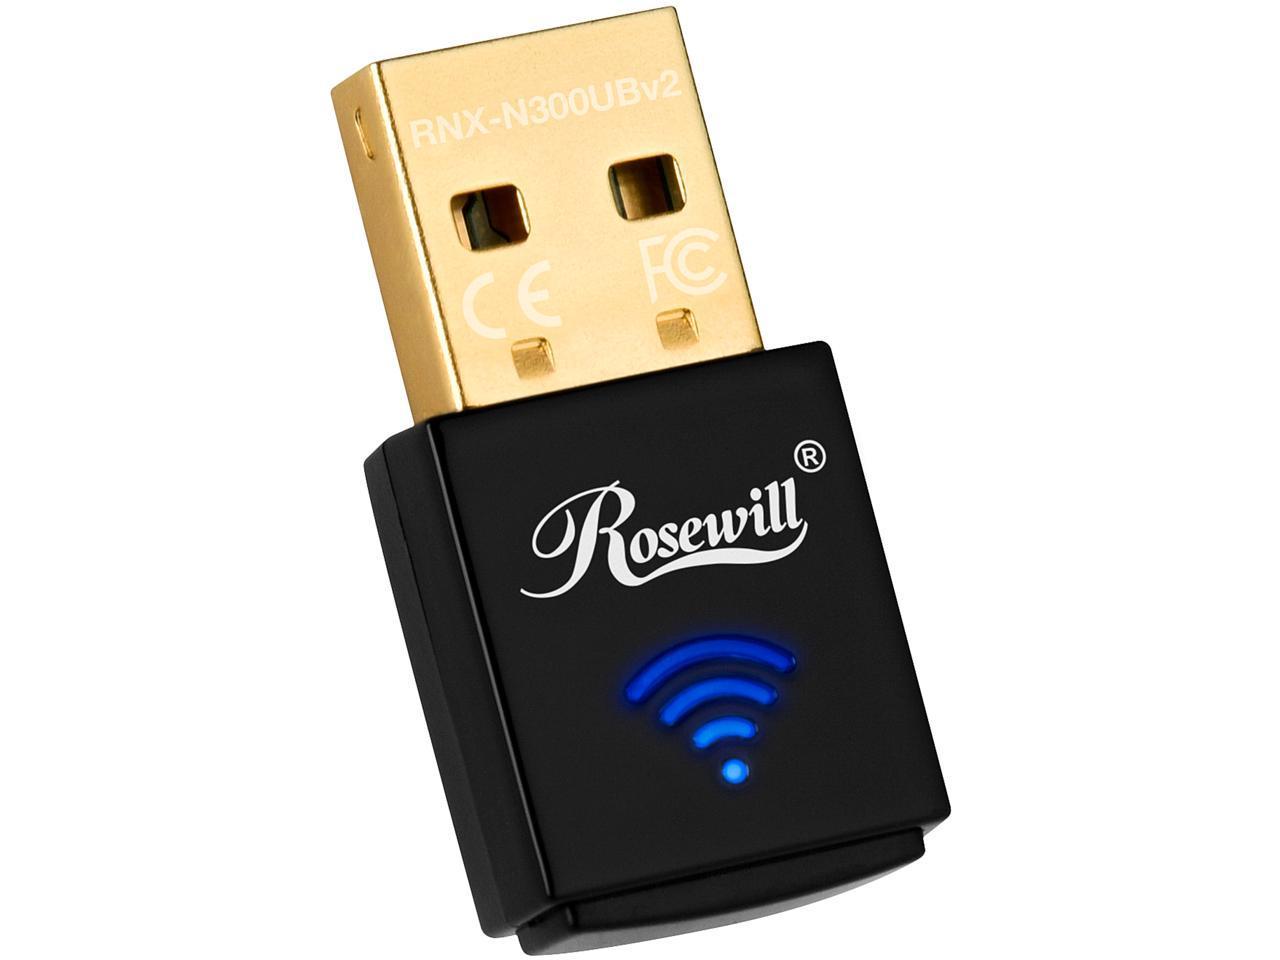 Rosewill N300 Wireless USB Wi-Fi Adapter, 300 Mbps Data Rate - Newegg.com | N300 Wireless Usb Adapter Schematic |  | Newegg.com